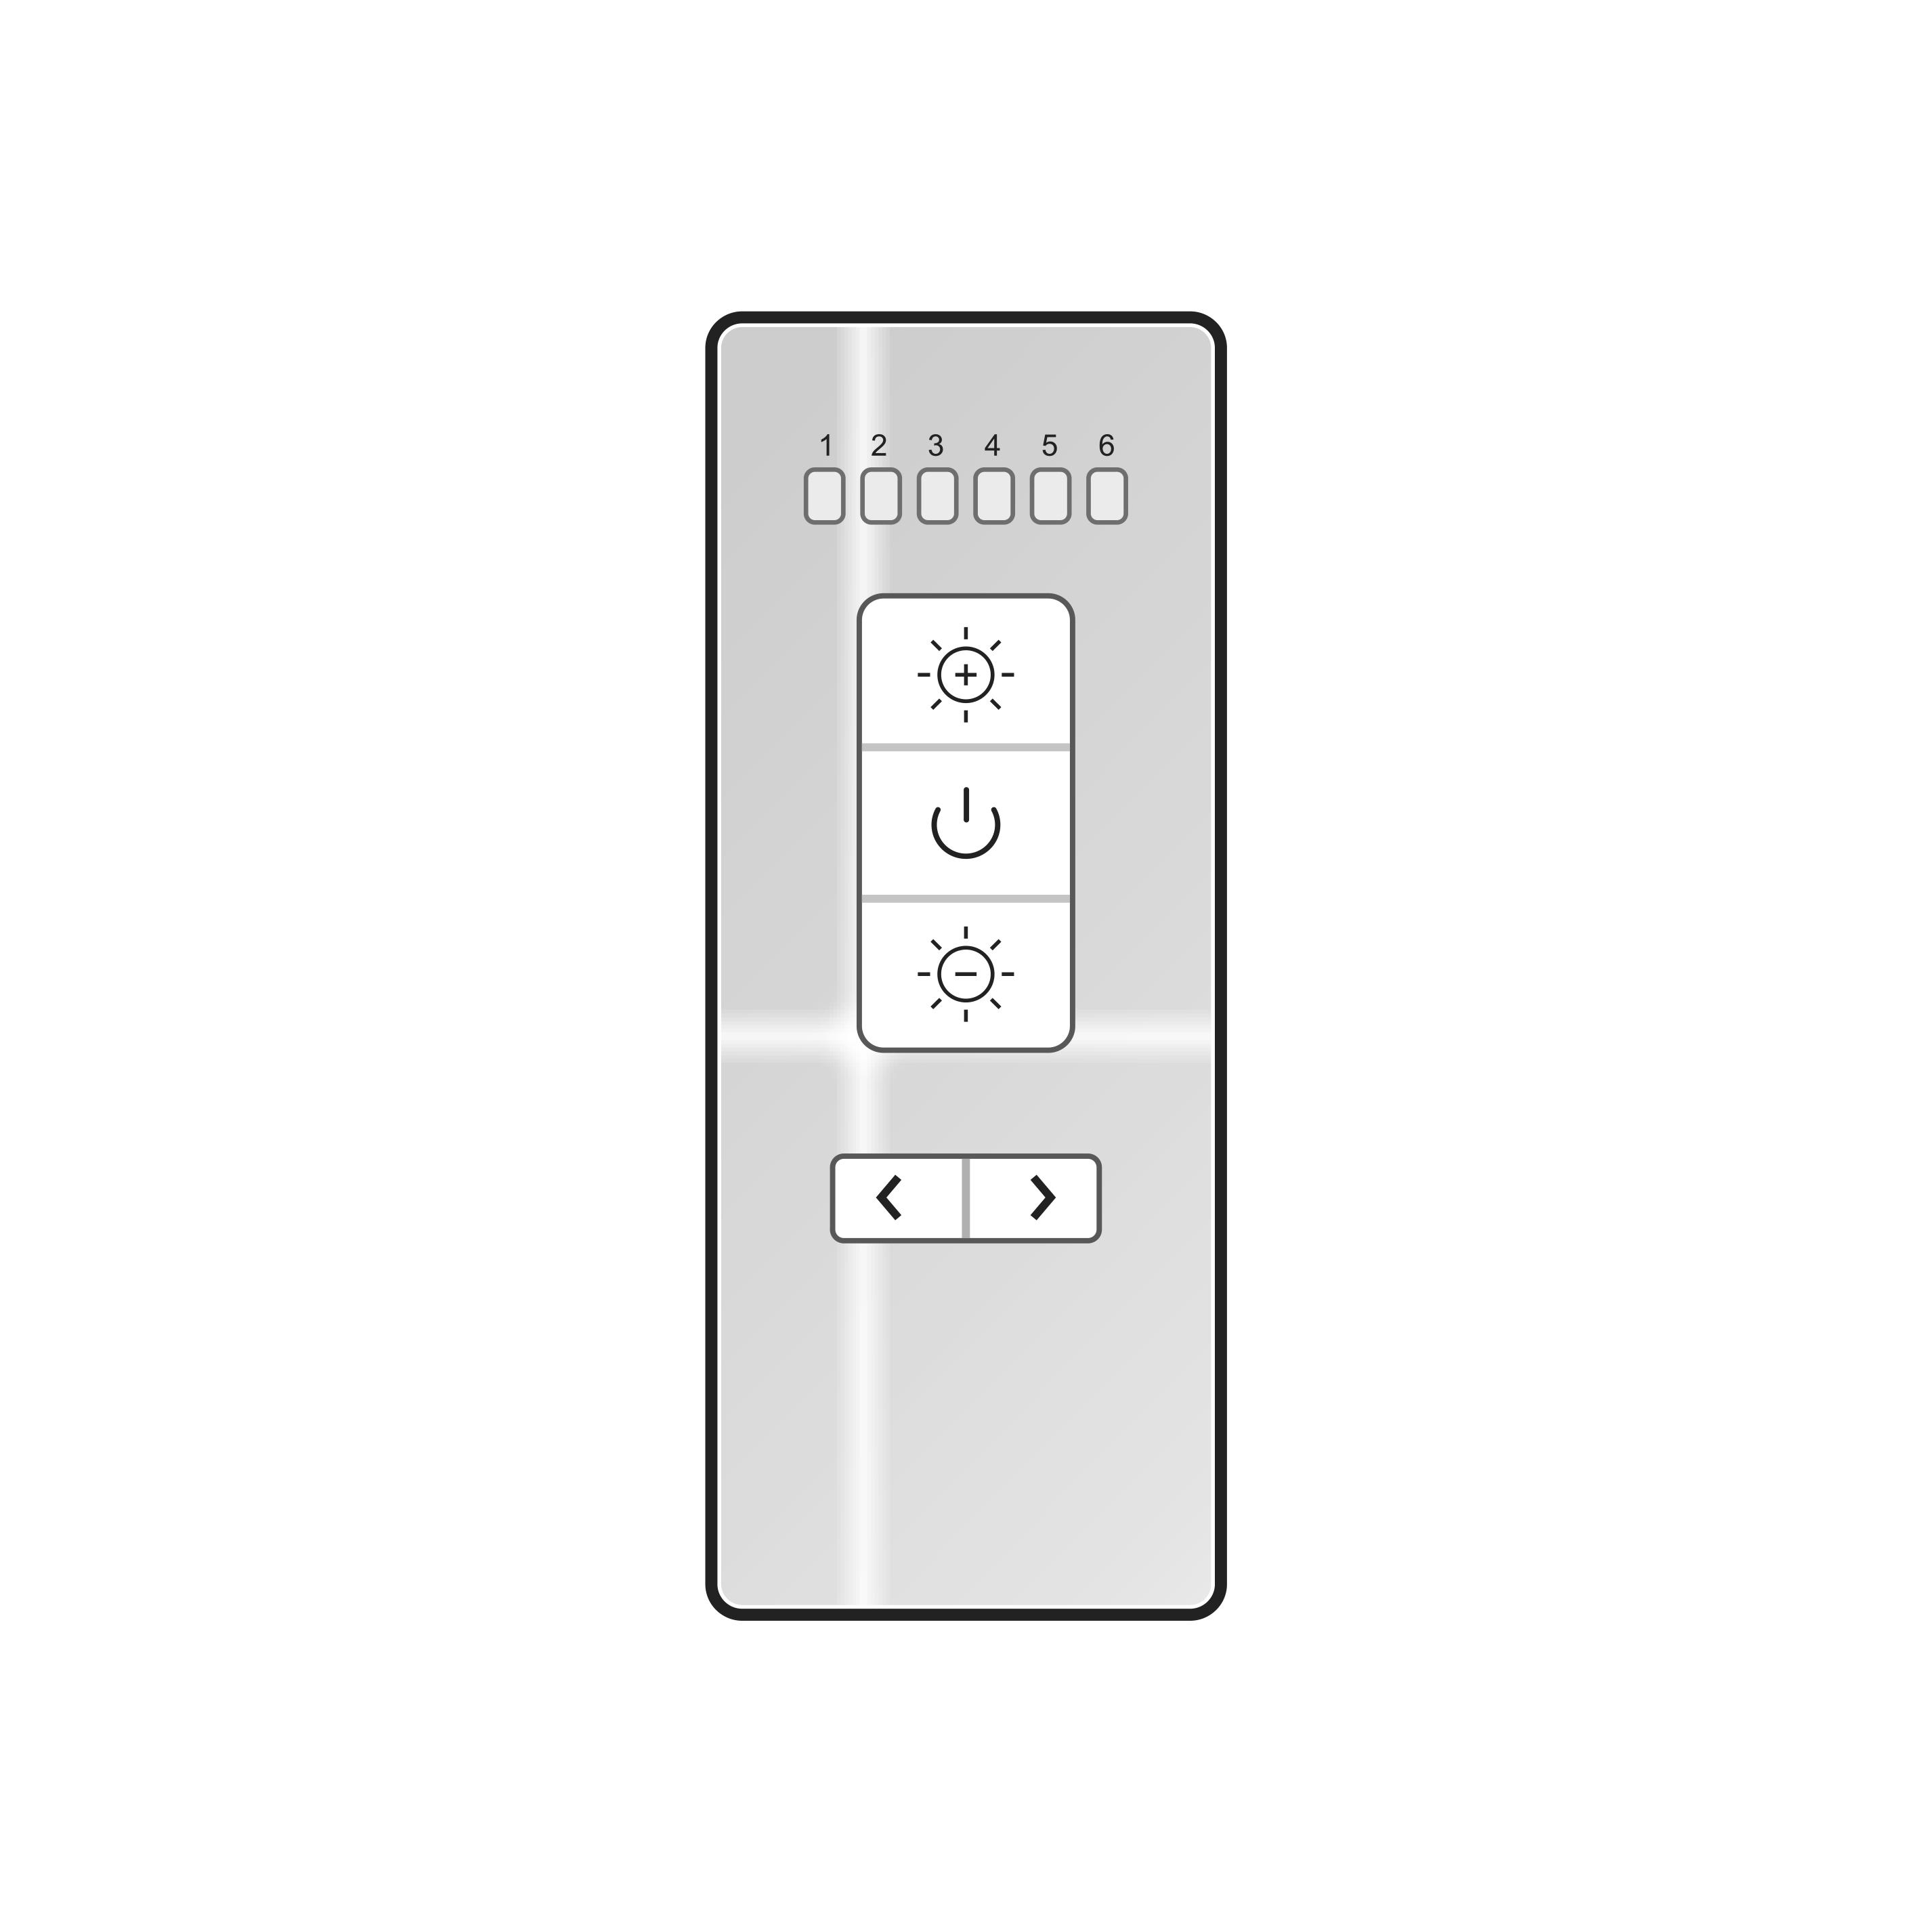 Productfoto_web